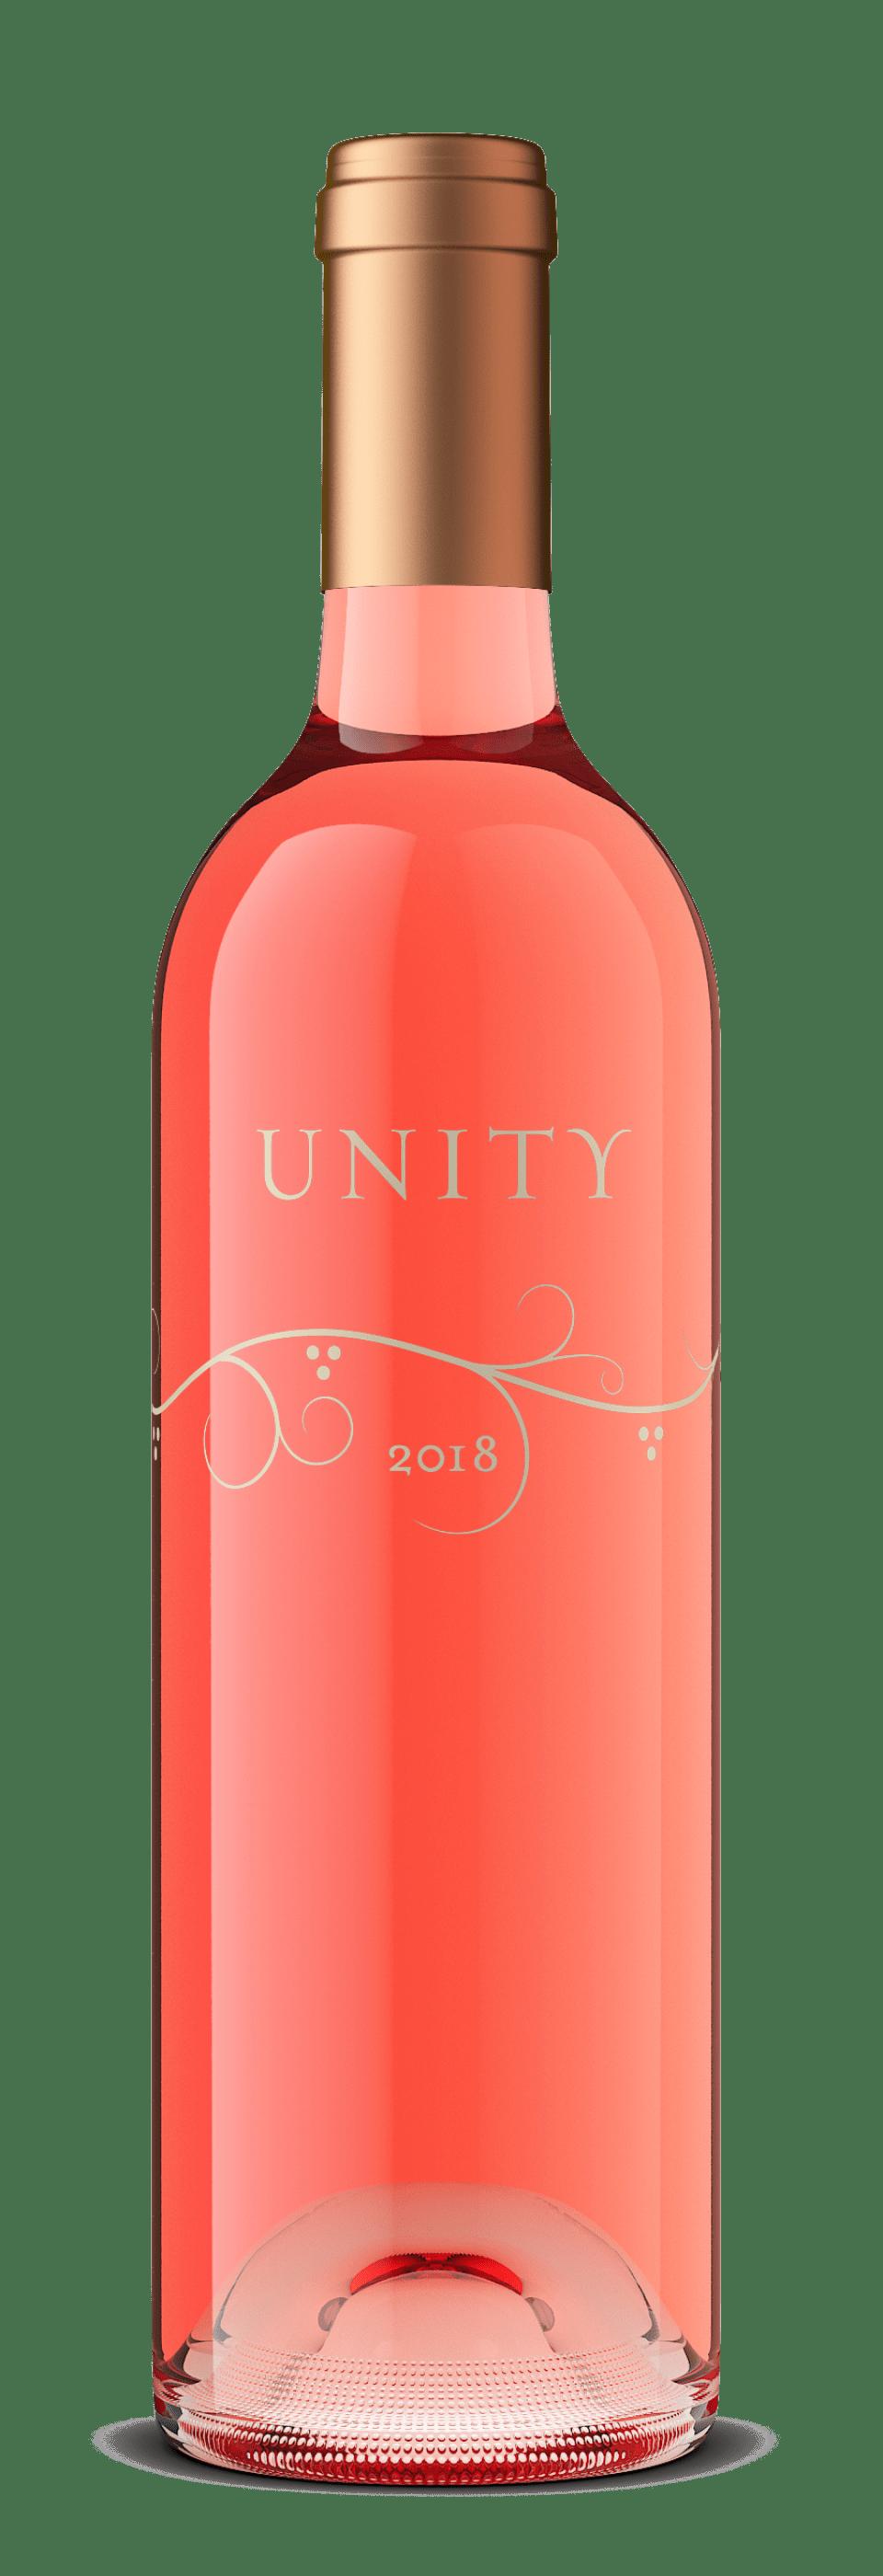 2018 UNITY Rosé